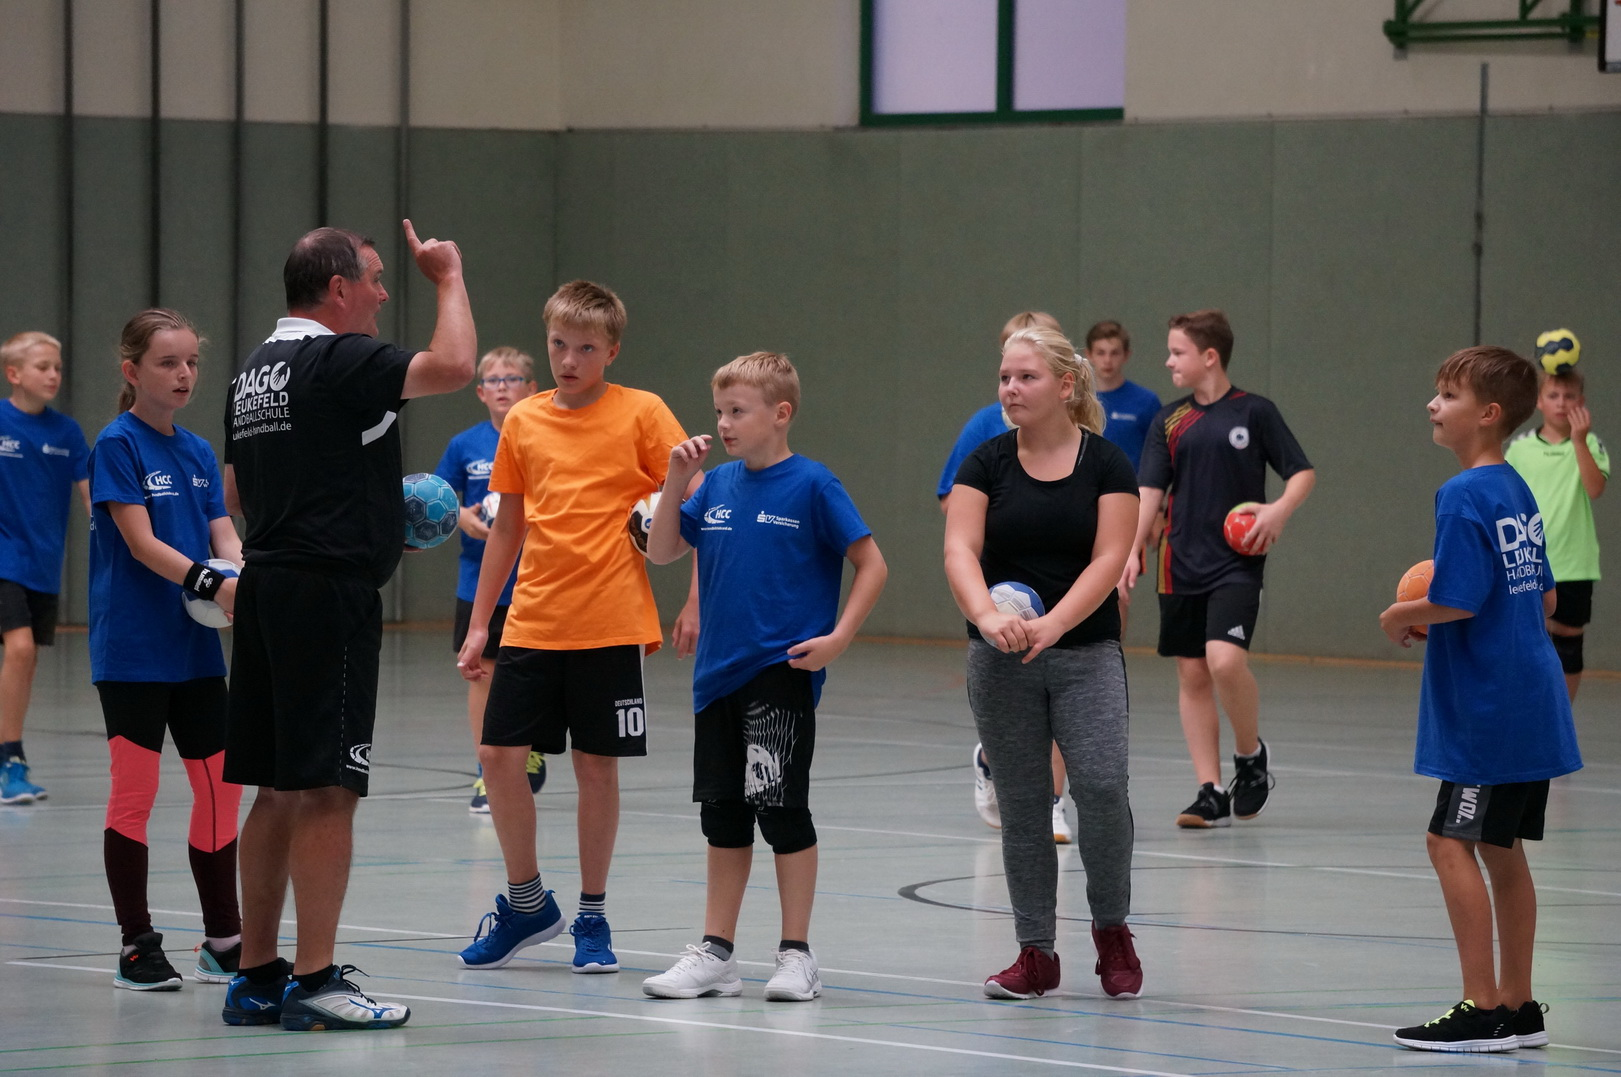 201808_Handballcamp_SDH_MG_160w